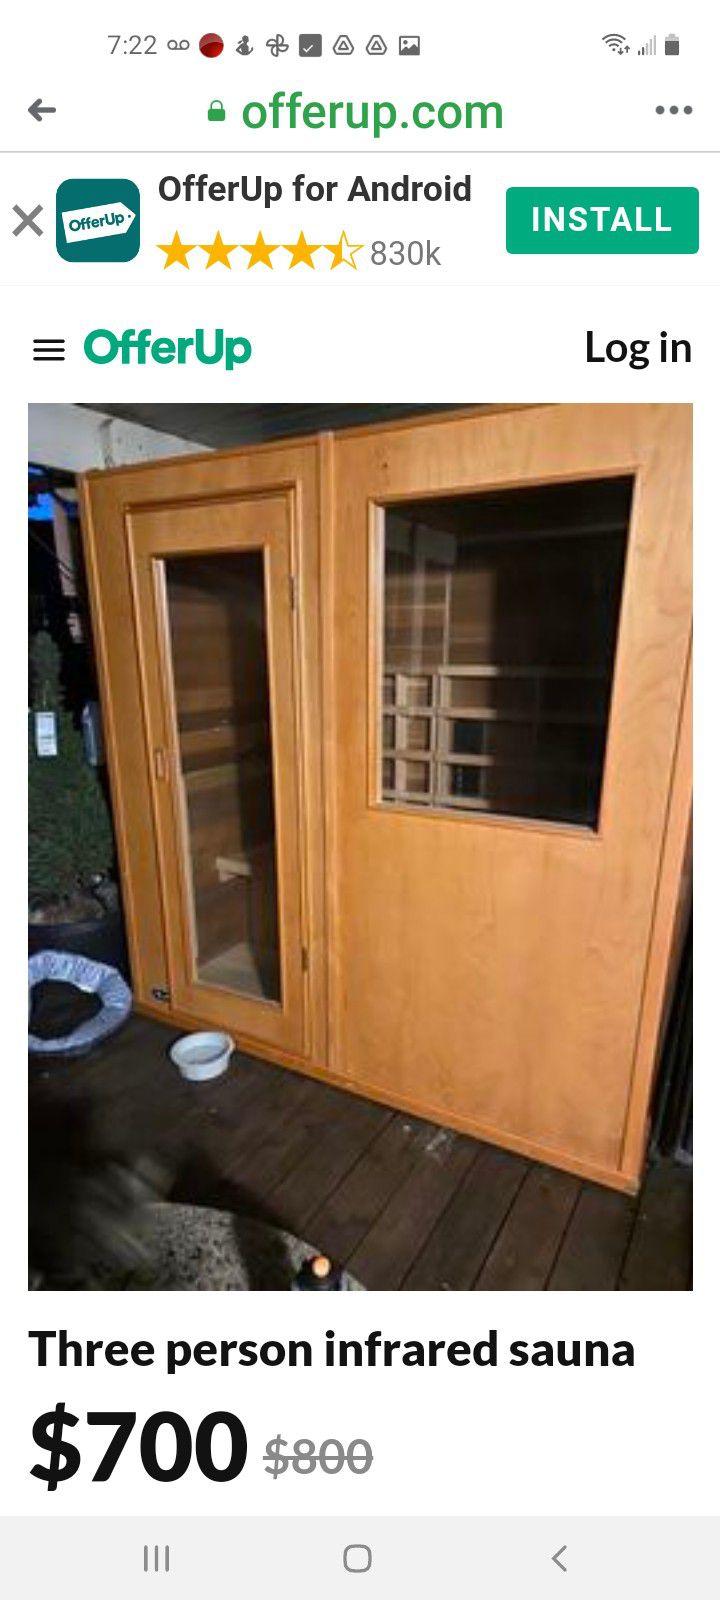 3 Person Infared Sauna